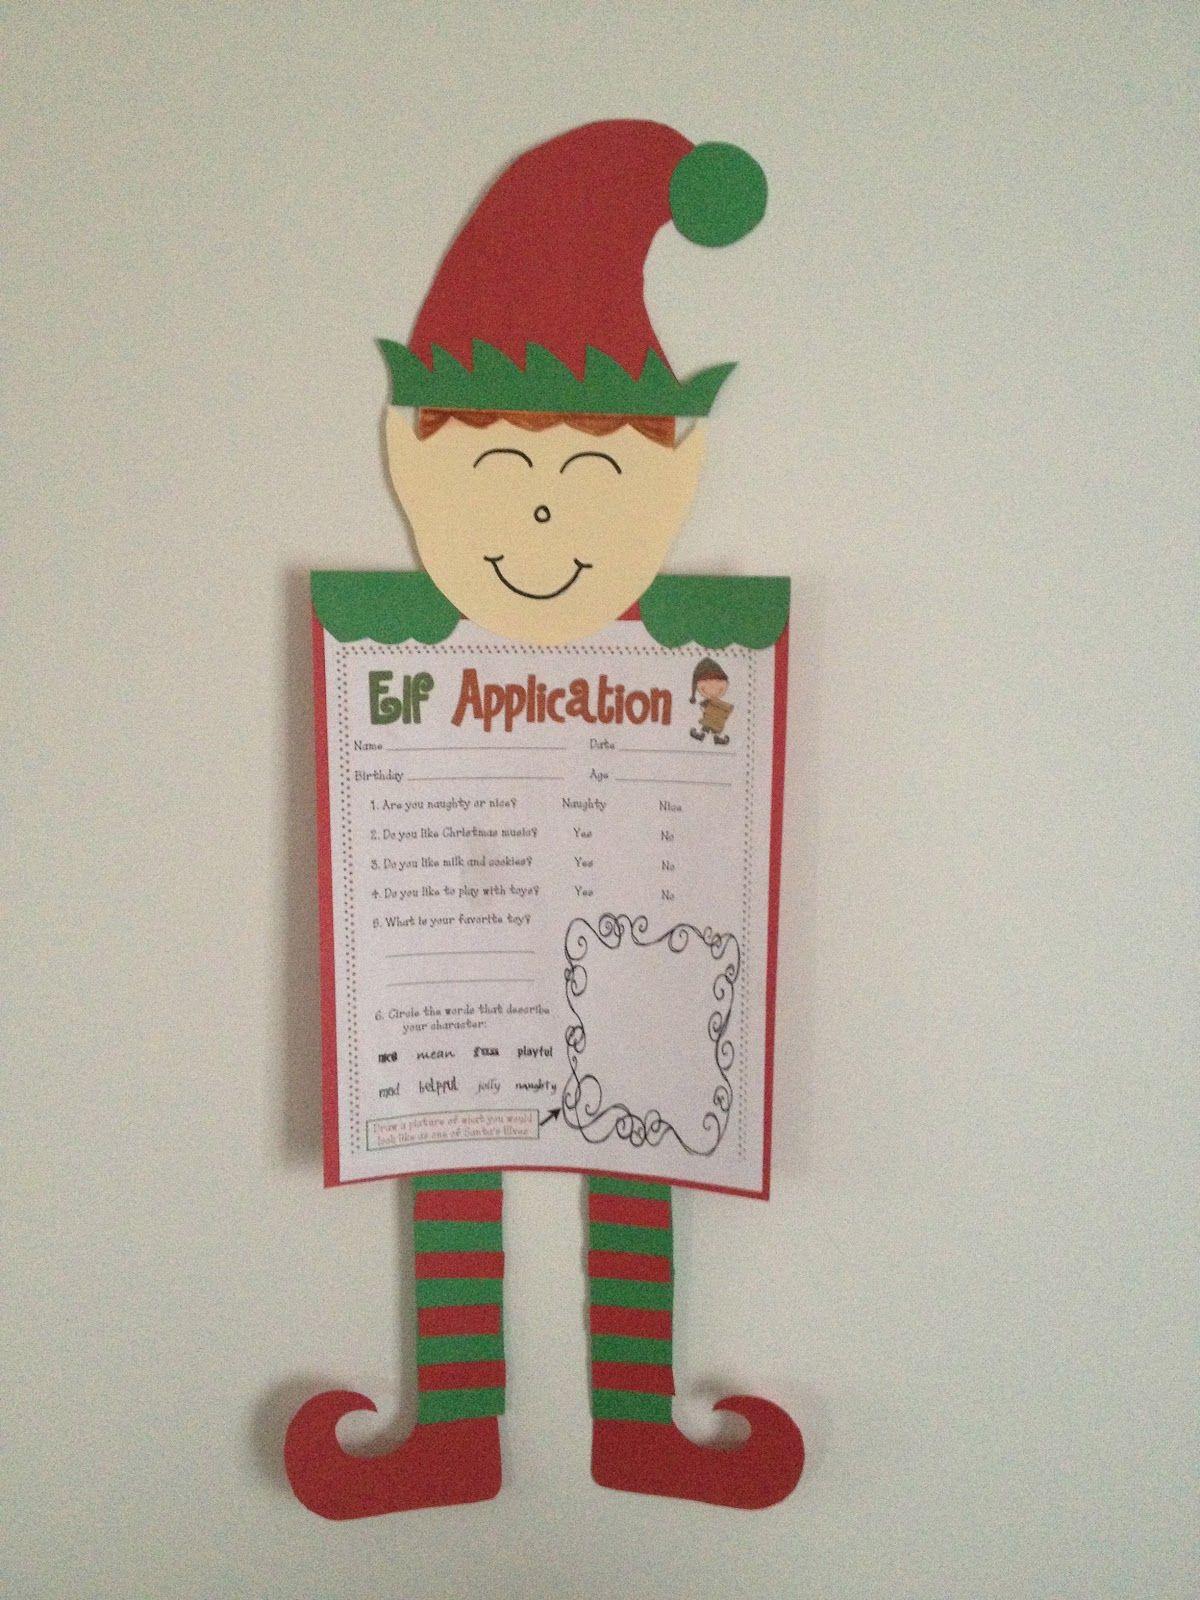 Elf Application First Grade Writing Prompt Worksheet Idea Elf